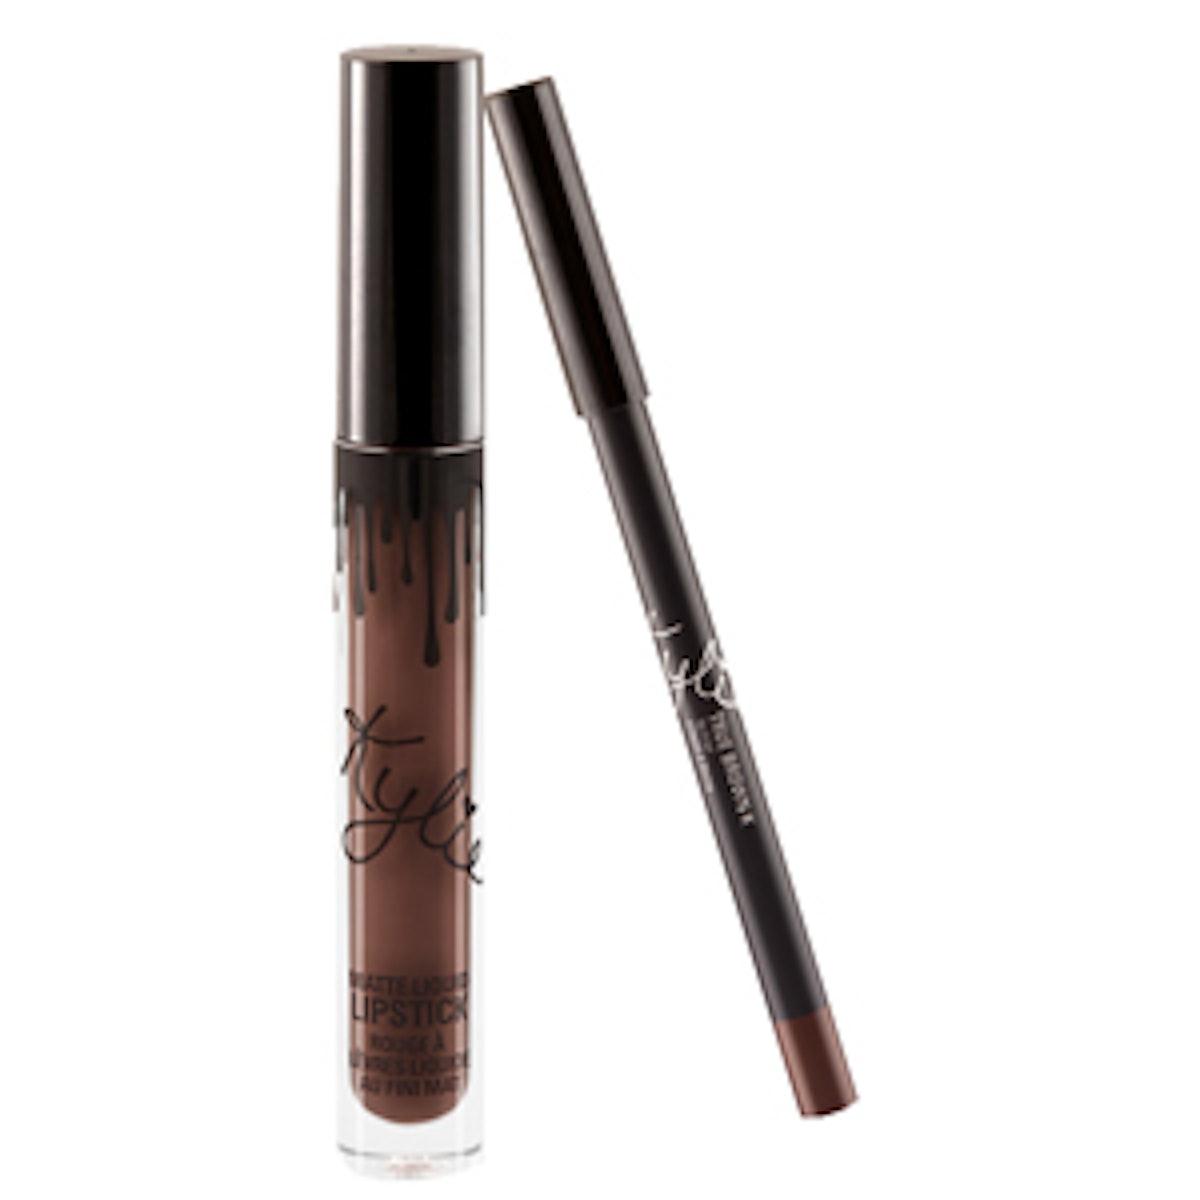 Kylie Jenner Lip Kit In True Brown K